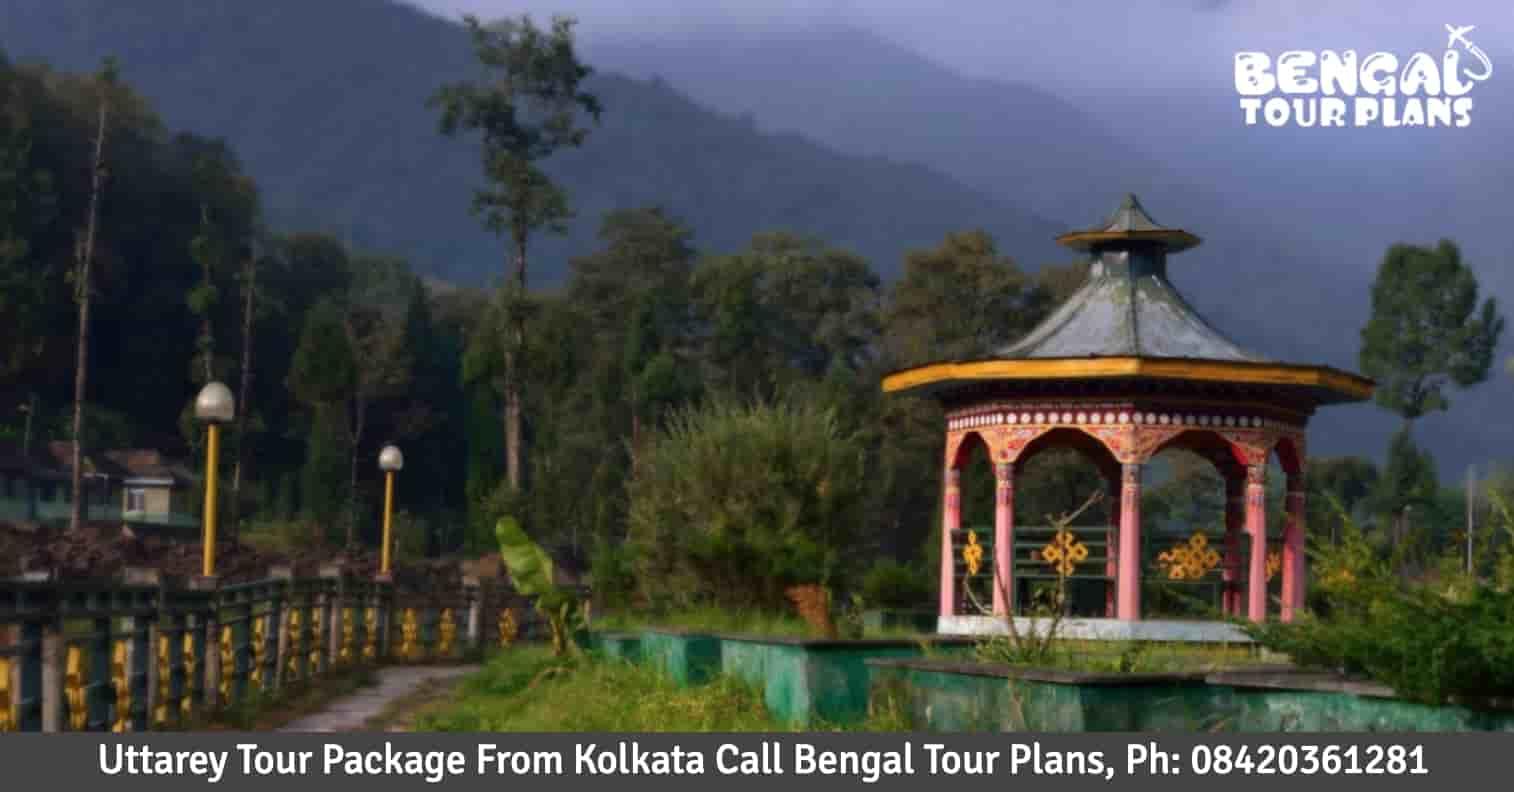 Uttarey Tour Package From Kolkata